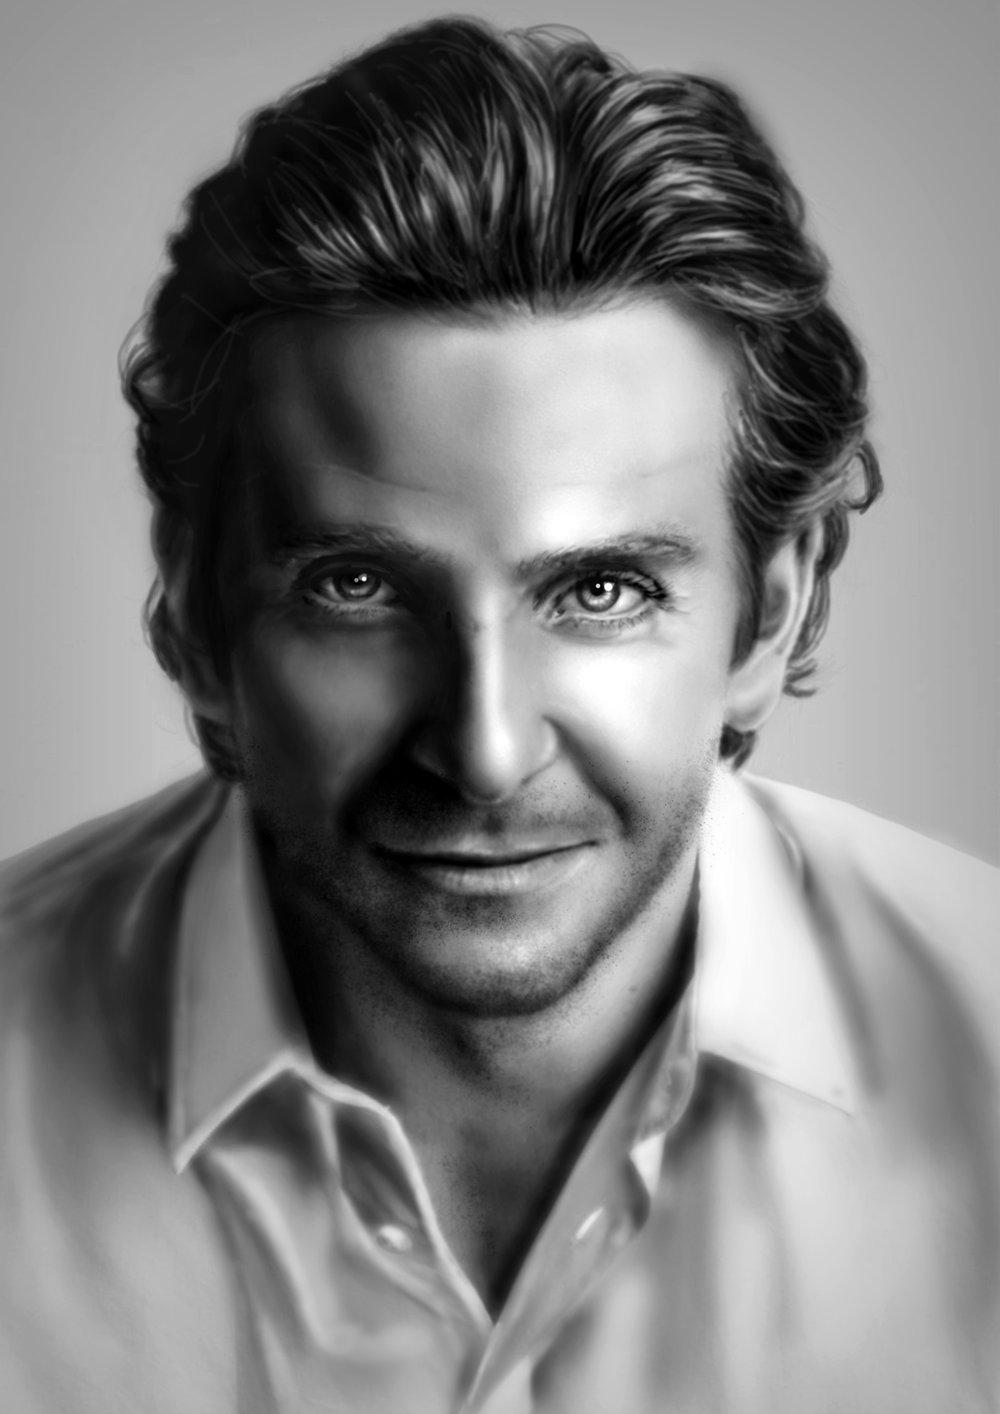 Bradley cooper portrait no logo jpg